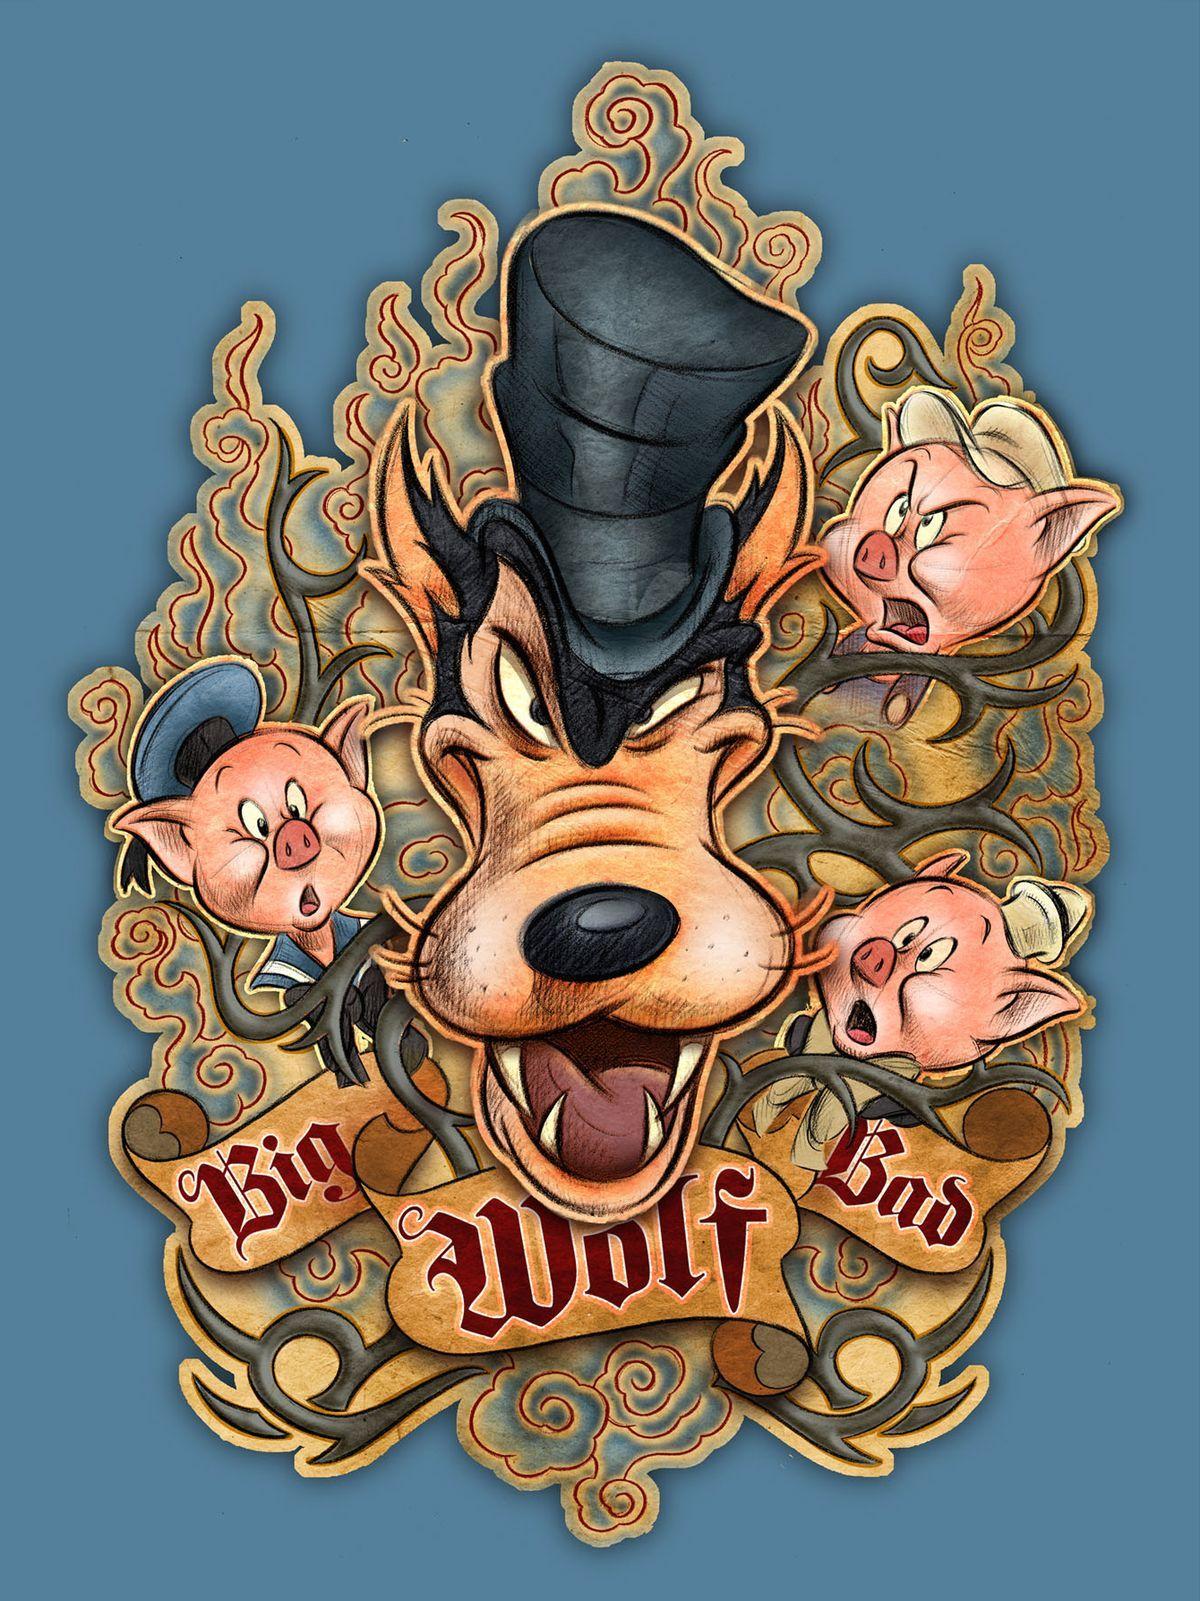 3eba060fee225f1e50abf62ead2ea20a Jpg 1 200 1 601 Pixels Bad Wolf Tattoo Pig Art Big Bad Wolf